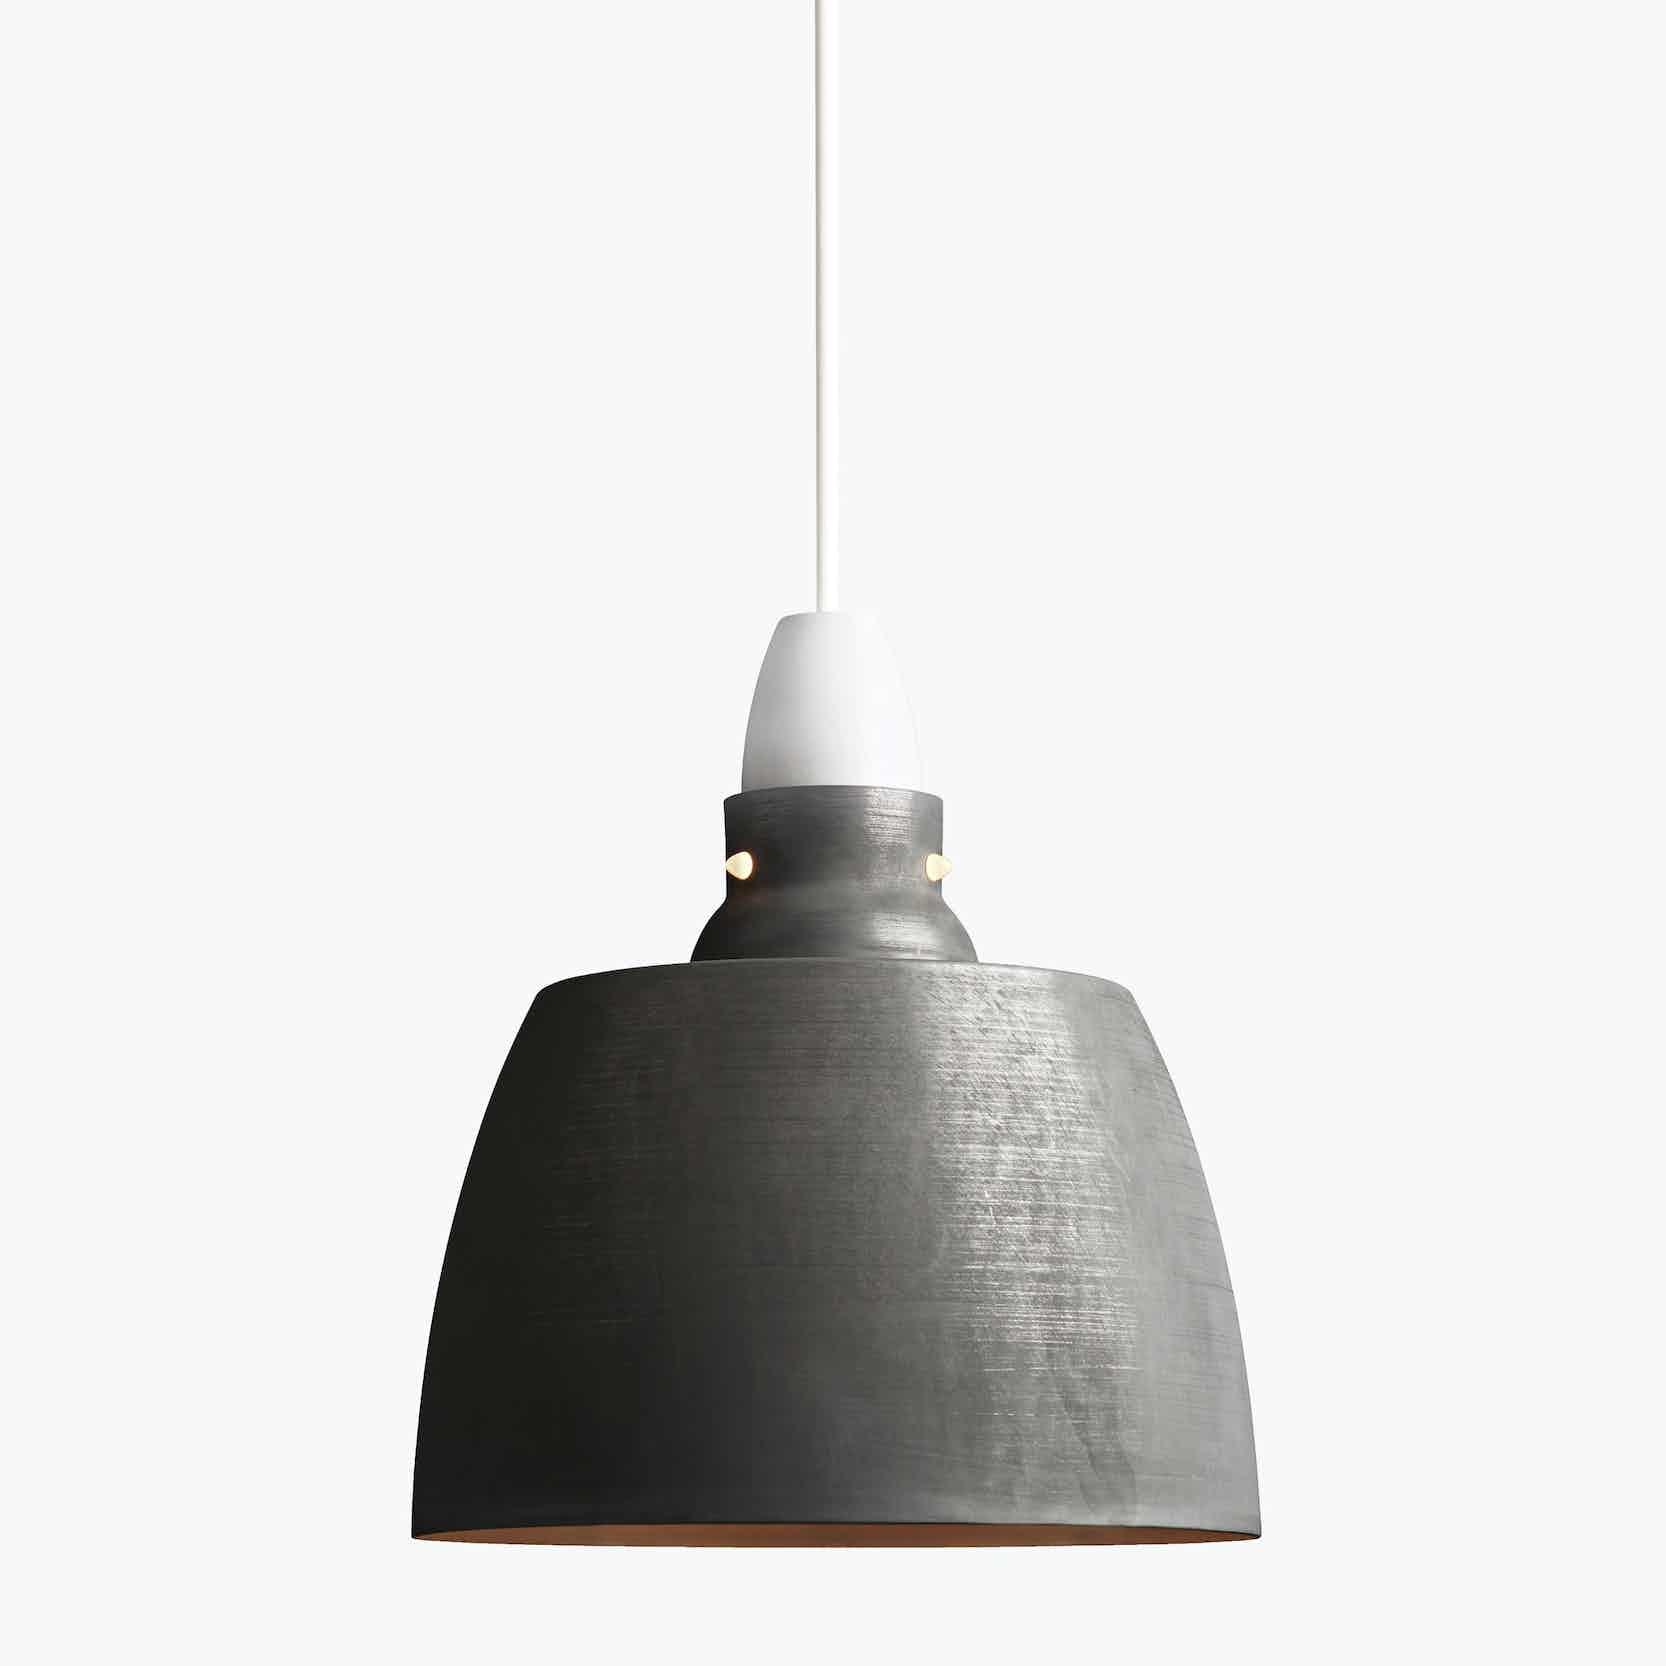 New works furniture hang on honey pendant oxidized aluminum haute living